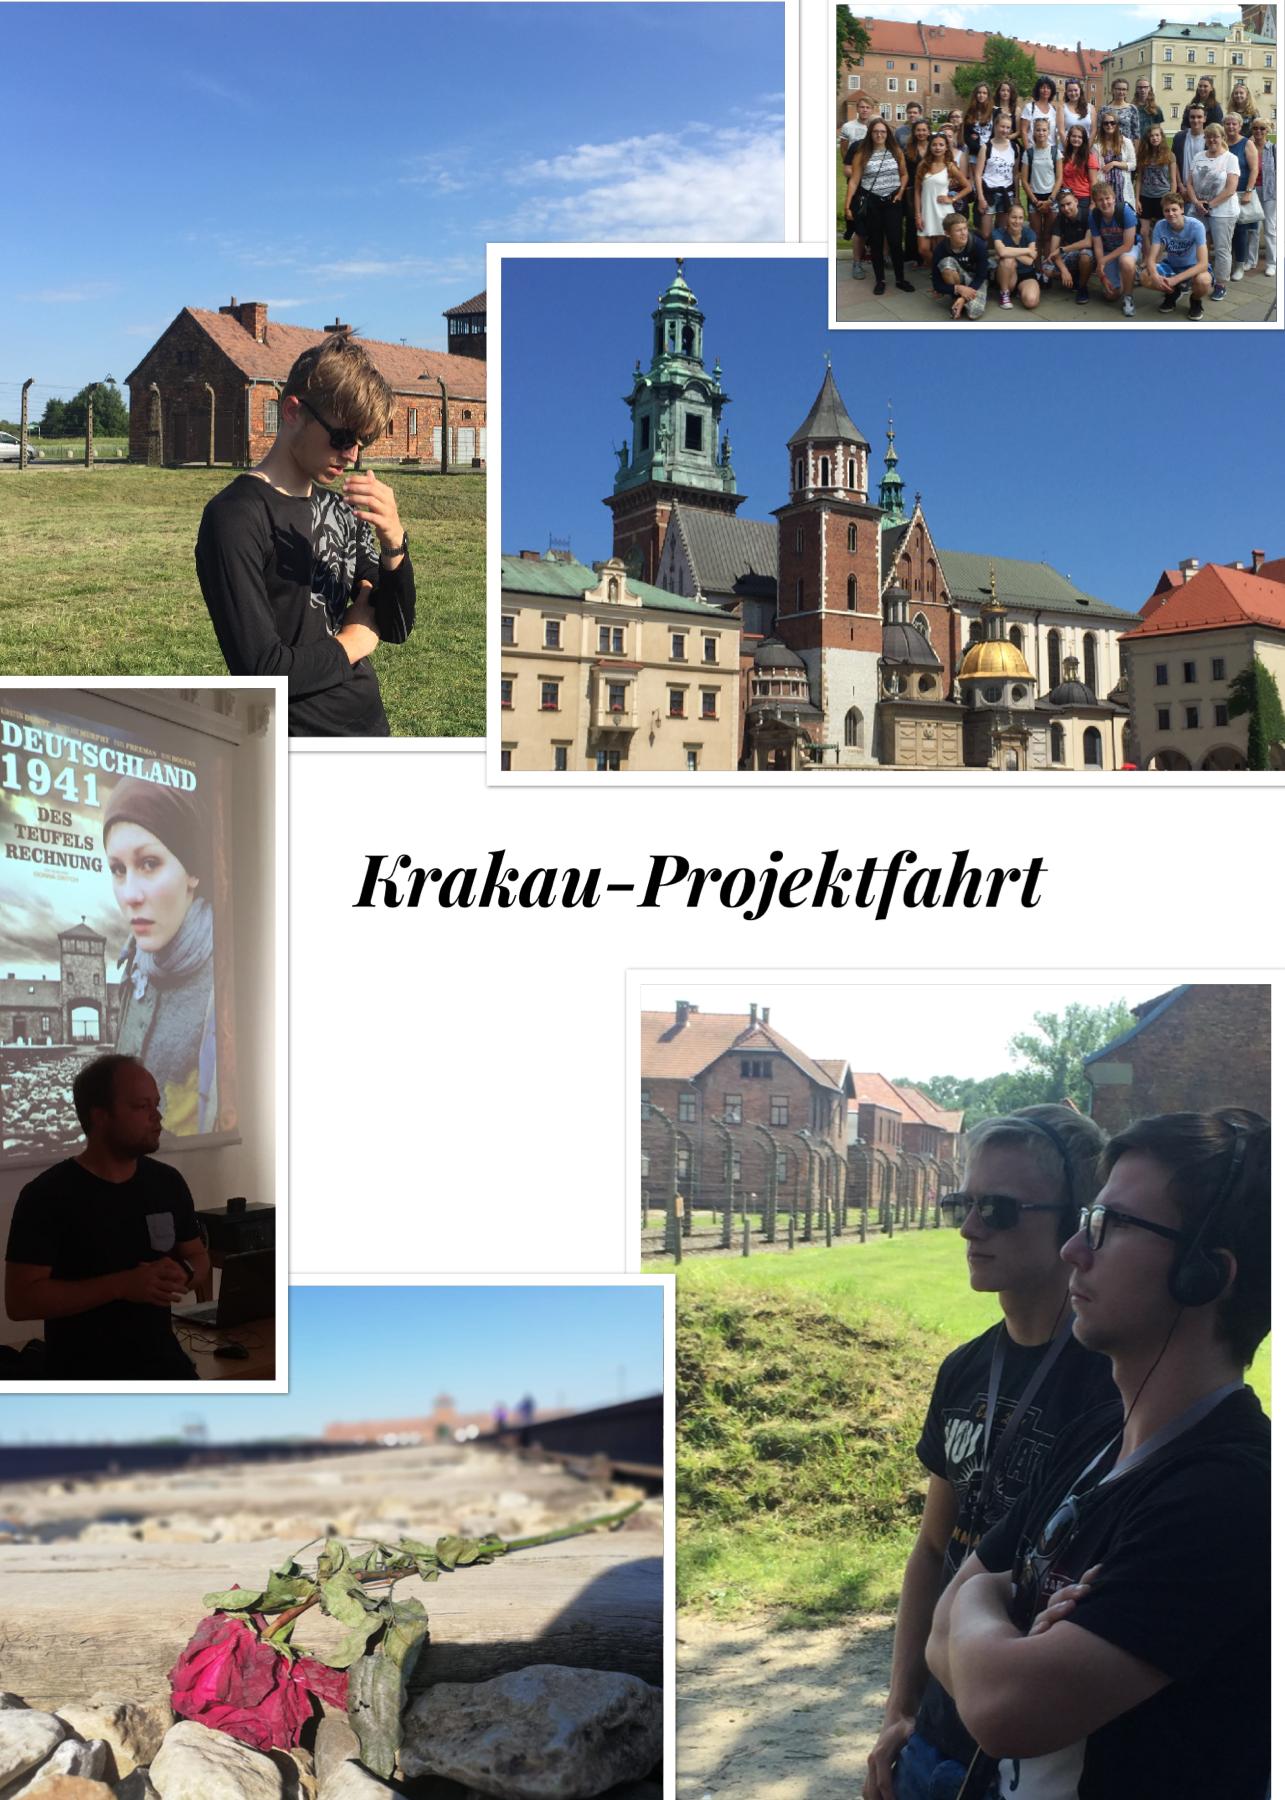 Politikprojekte_Krakau